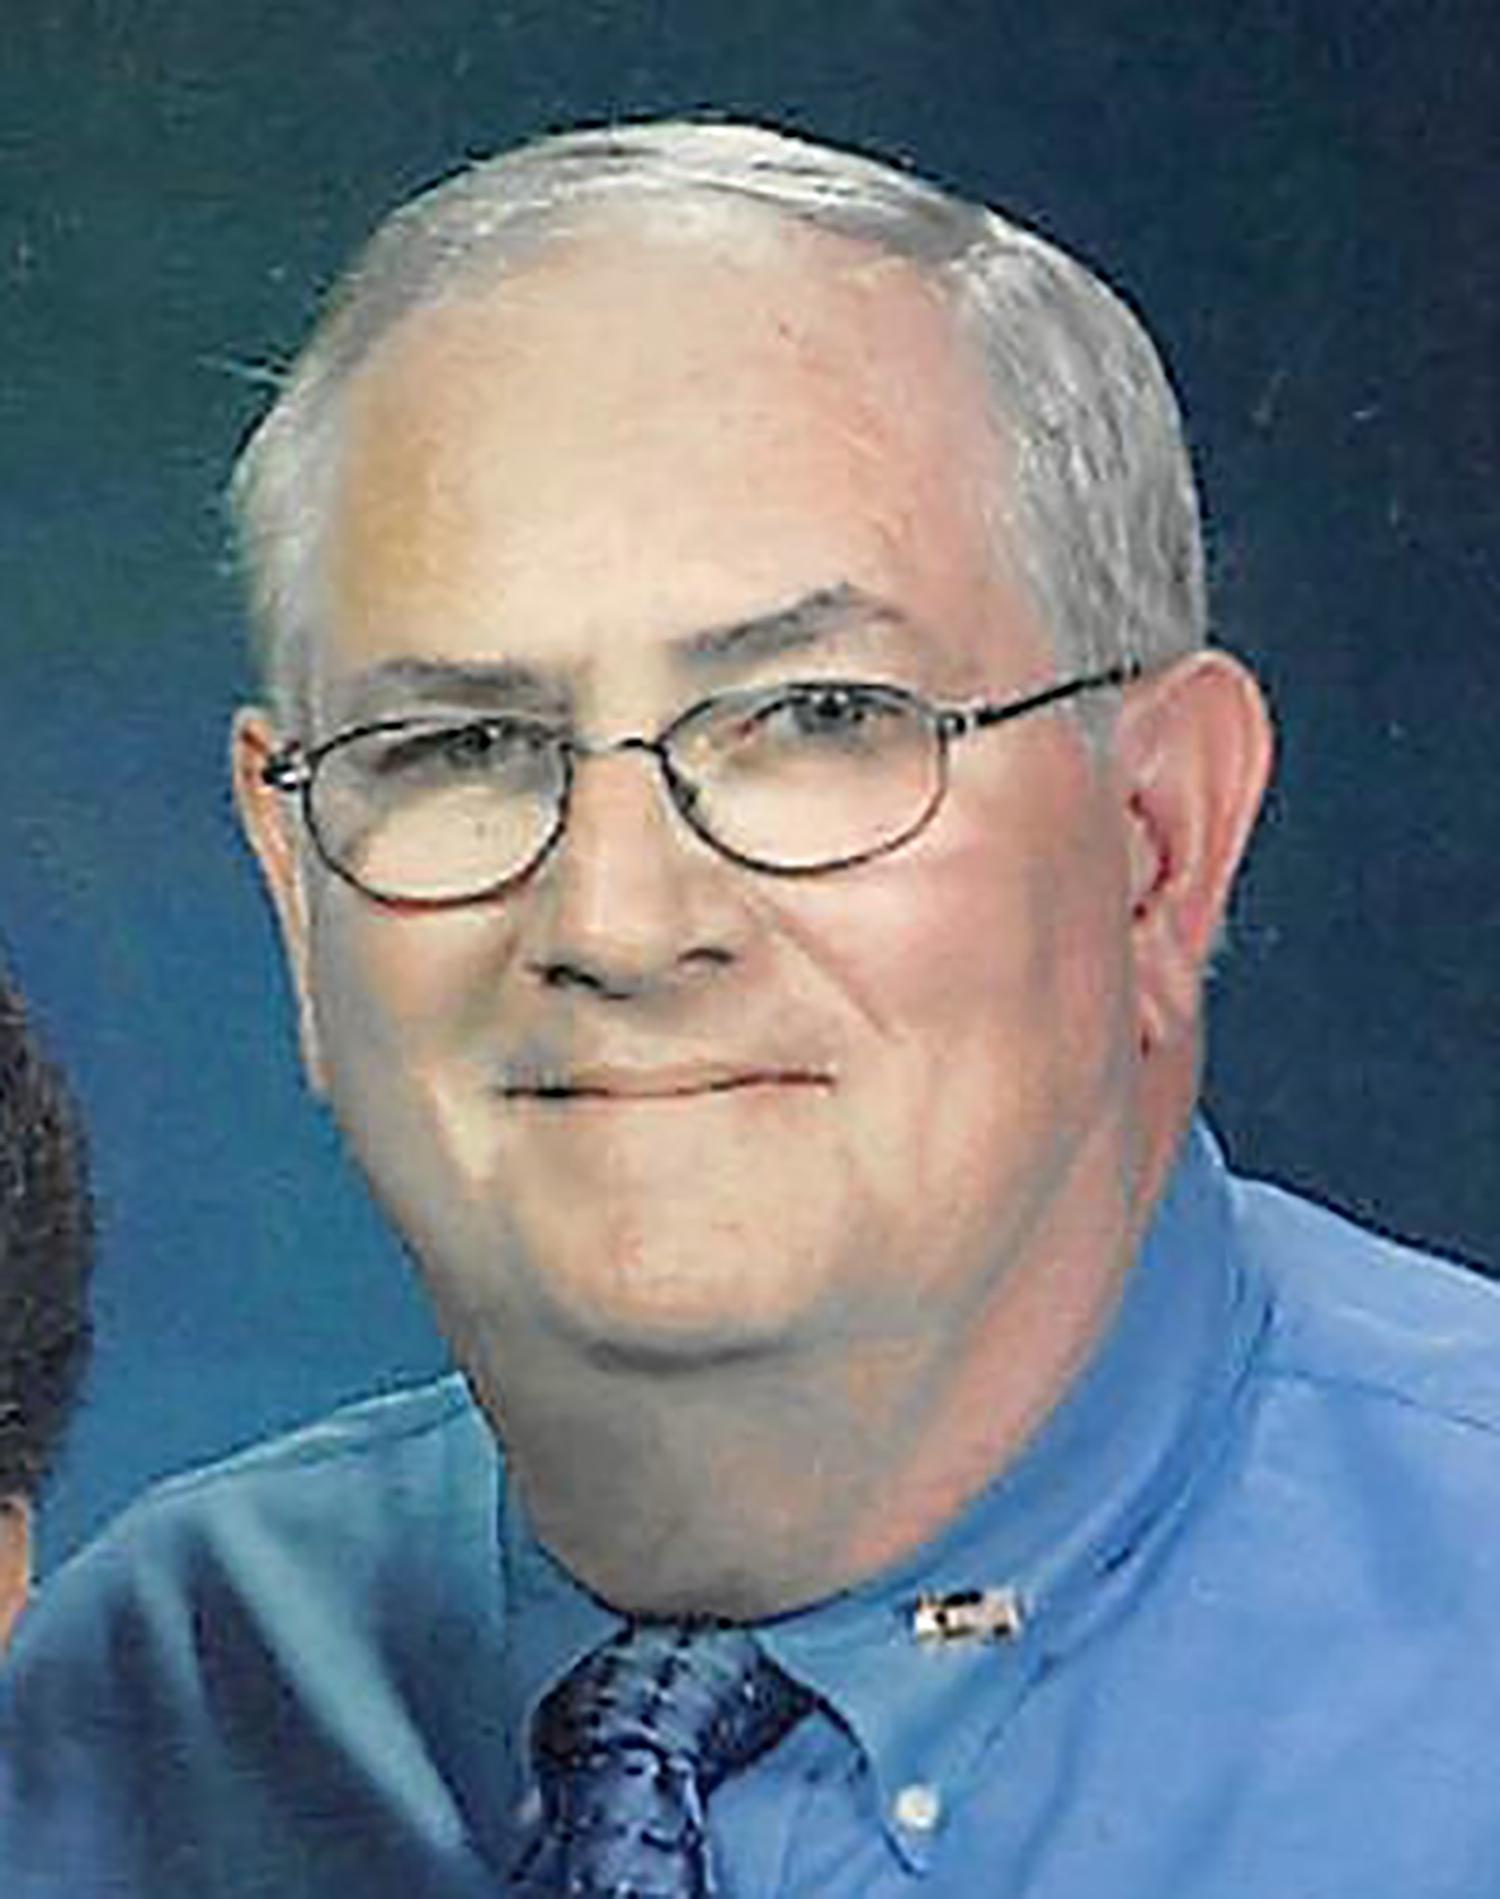 City mourns passing of Joe Cullen